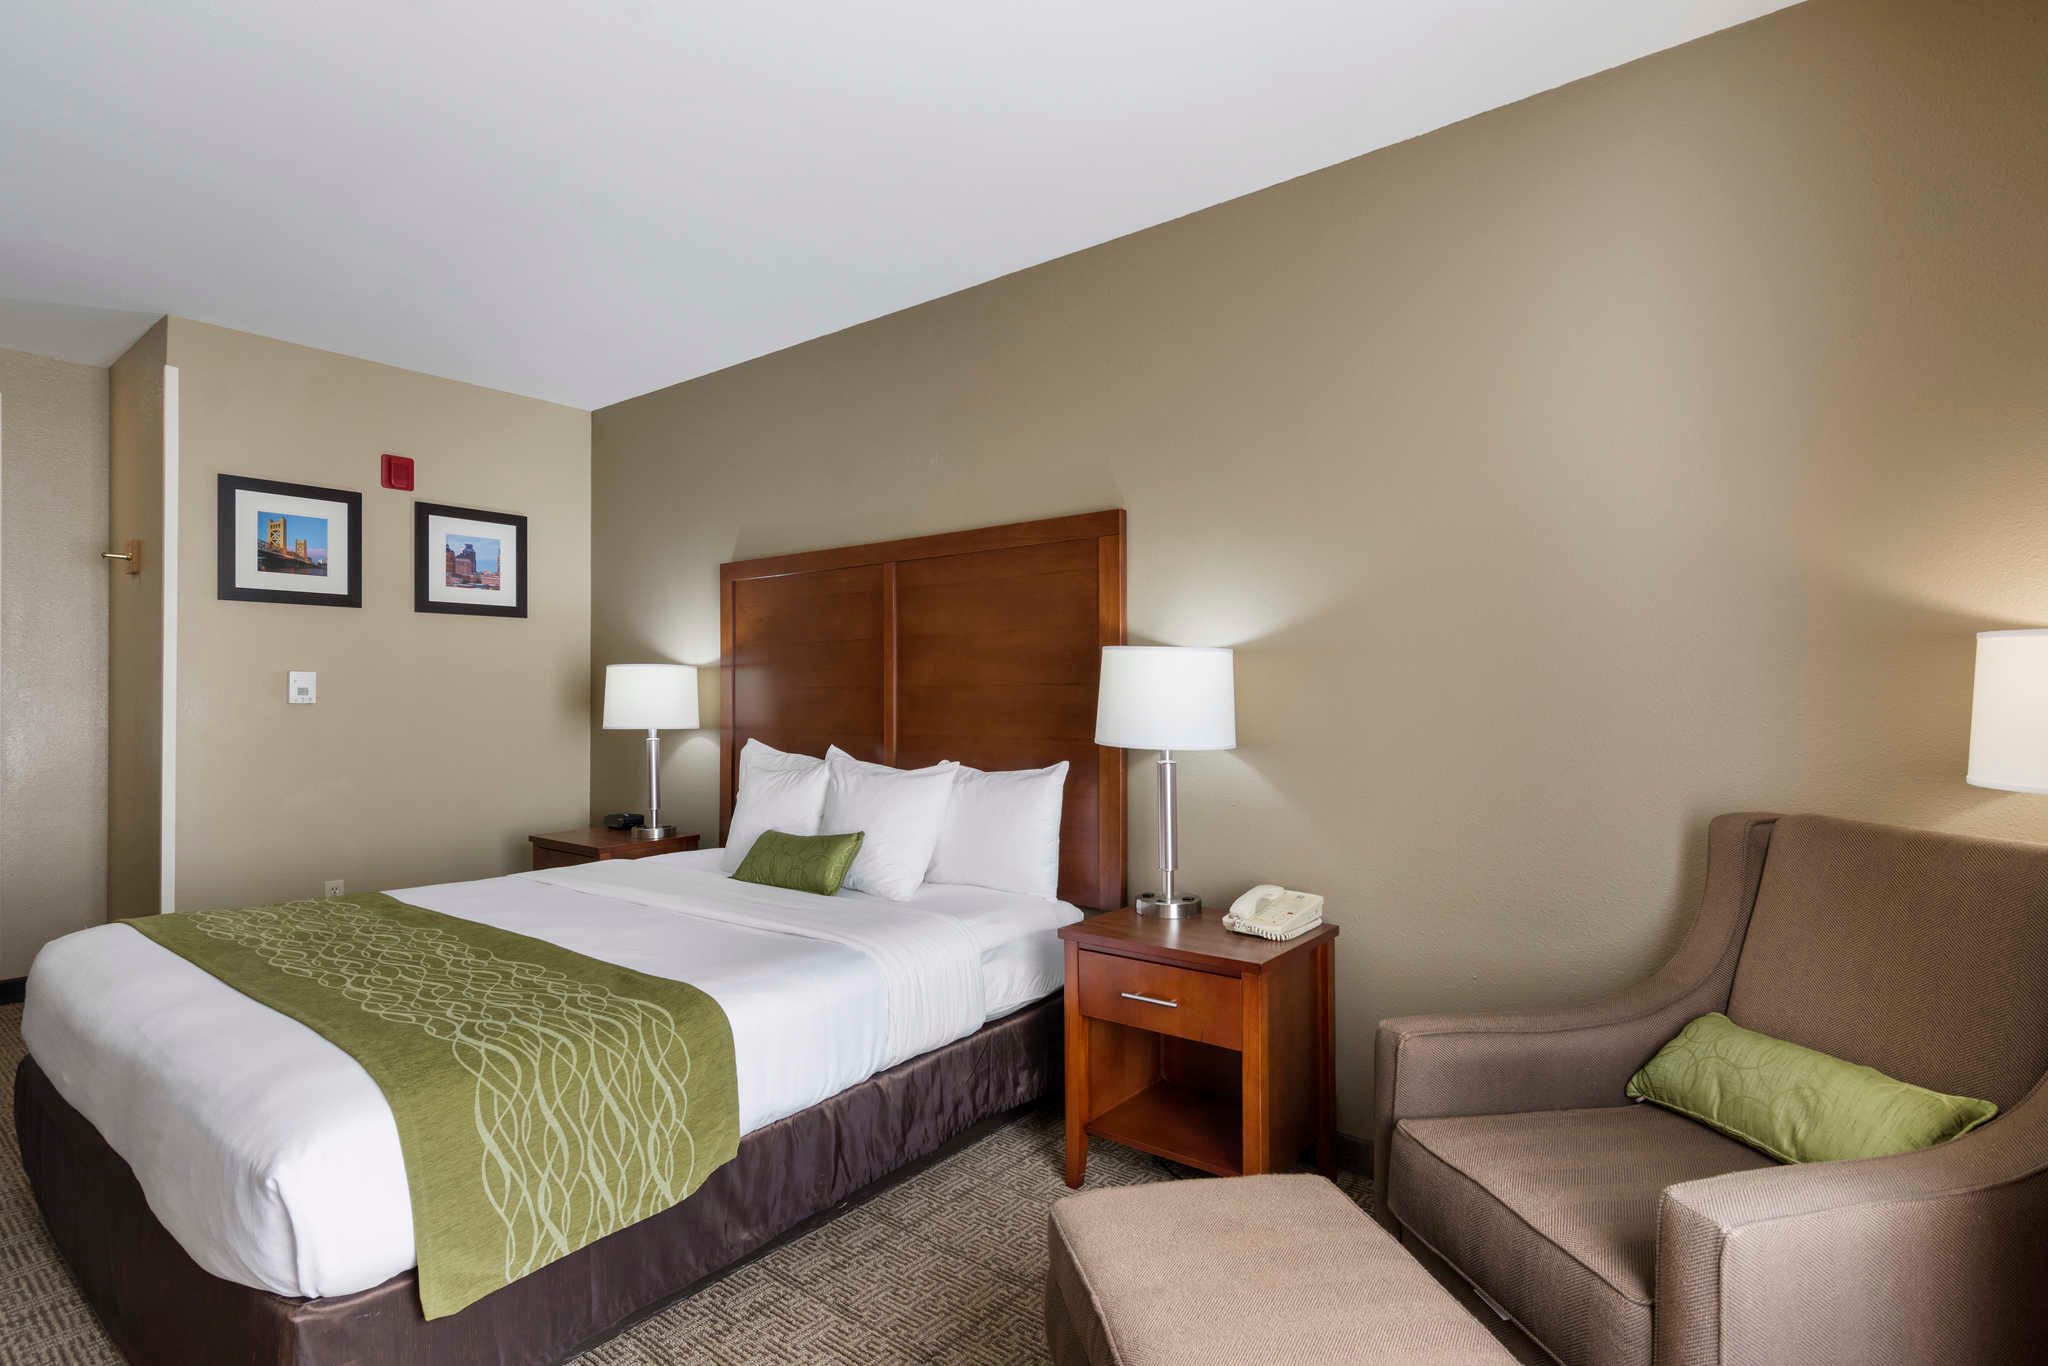 Comfort Inn & Suites Sacramento - University Area image 20